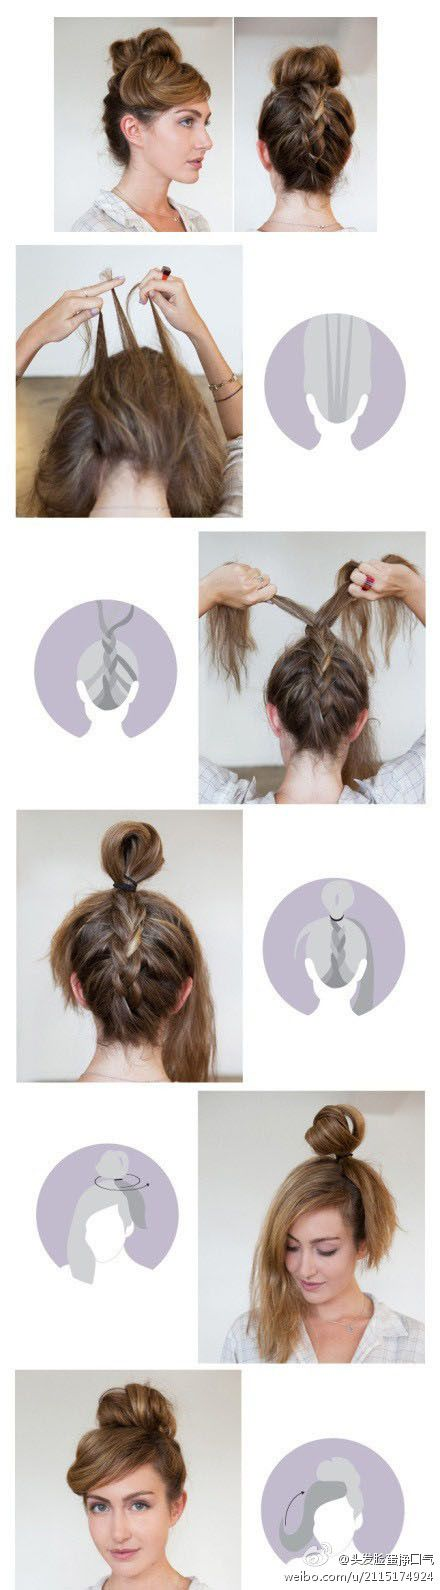 upside down braid tutorial